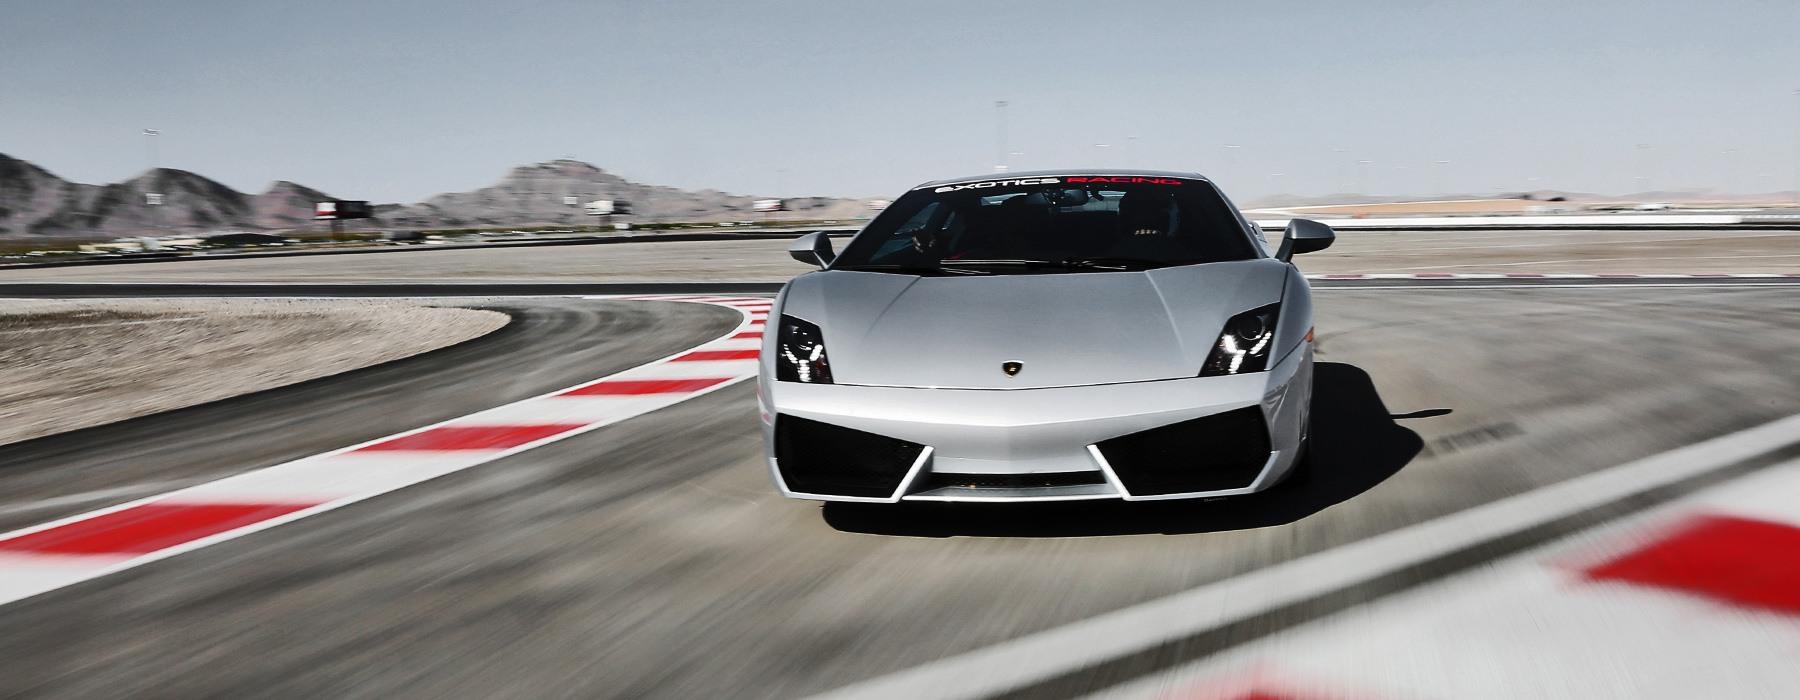 Drive a Lamborghini Gallardo